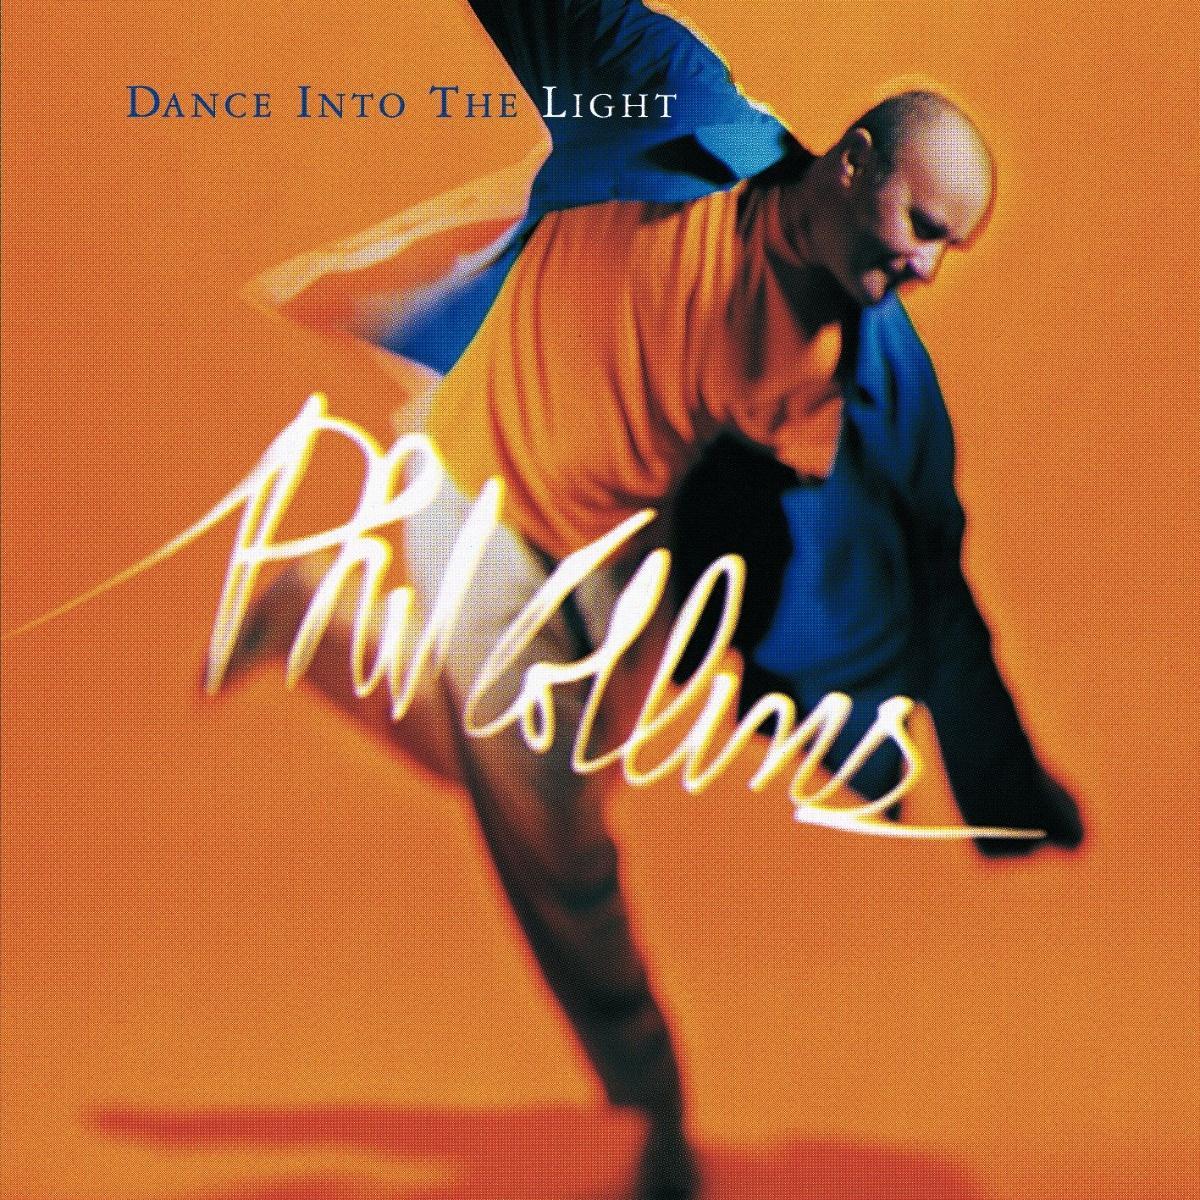 Dance into the Light - Phil Collins - Musik - WEA - 0706301616123 - 14/10-1996